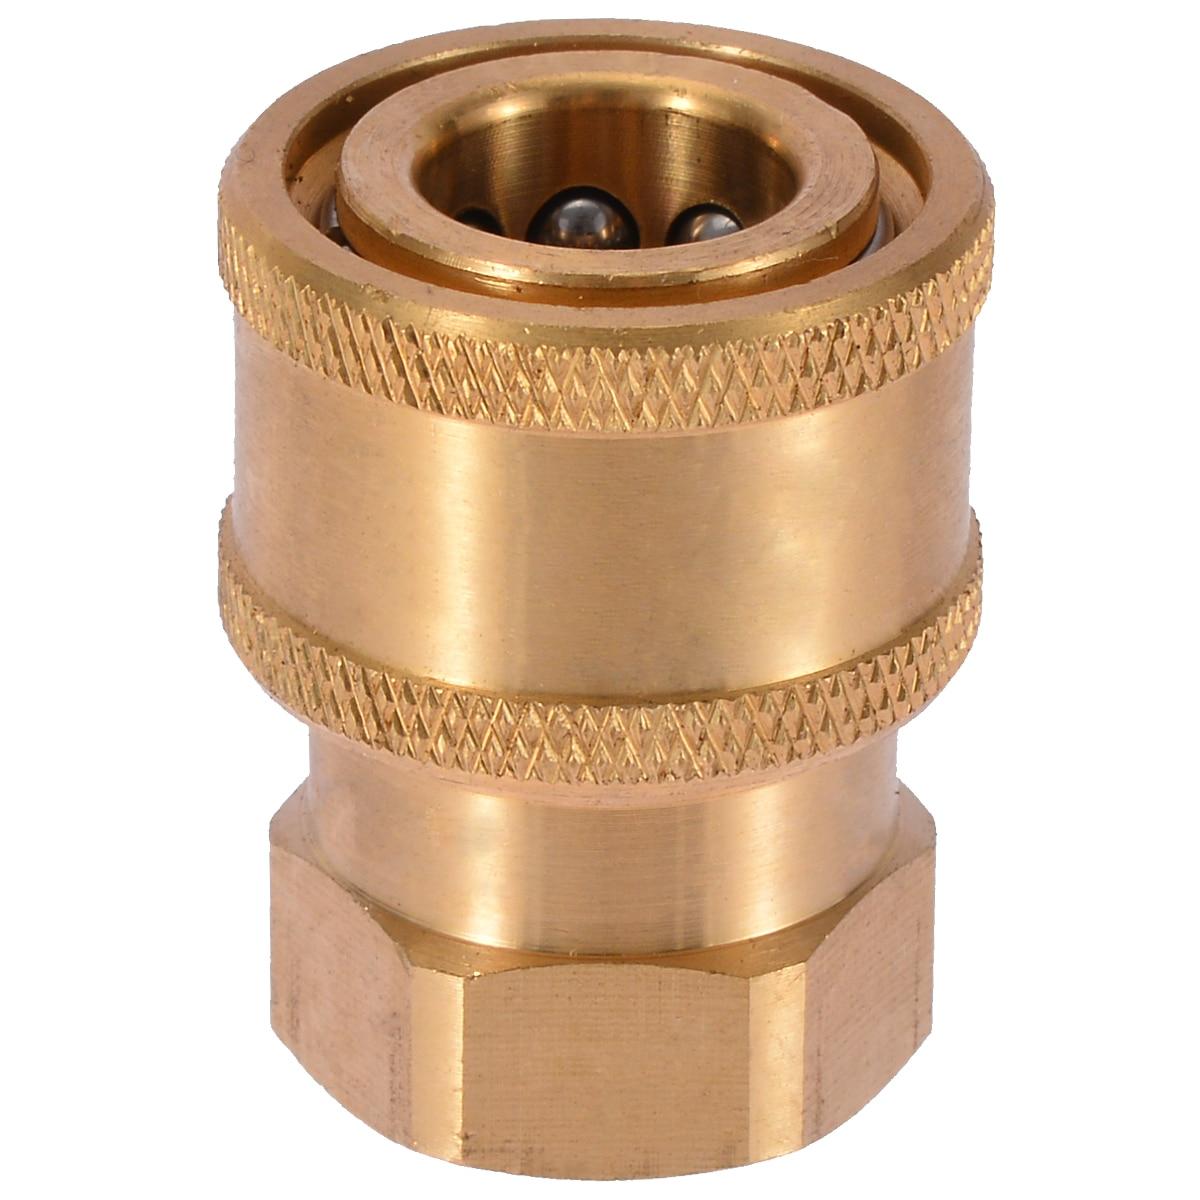 4x Brass Quick Release Coupler Pressure Washer Garden Hose Watering Kits